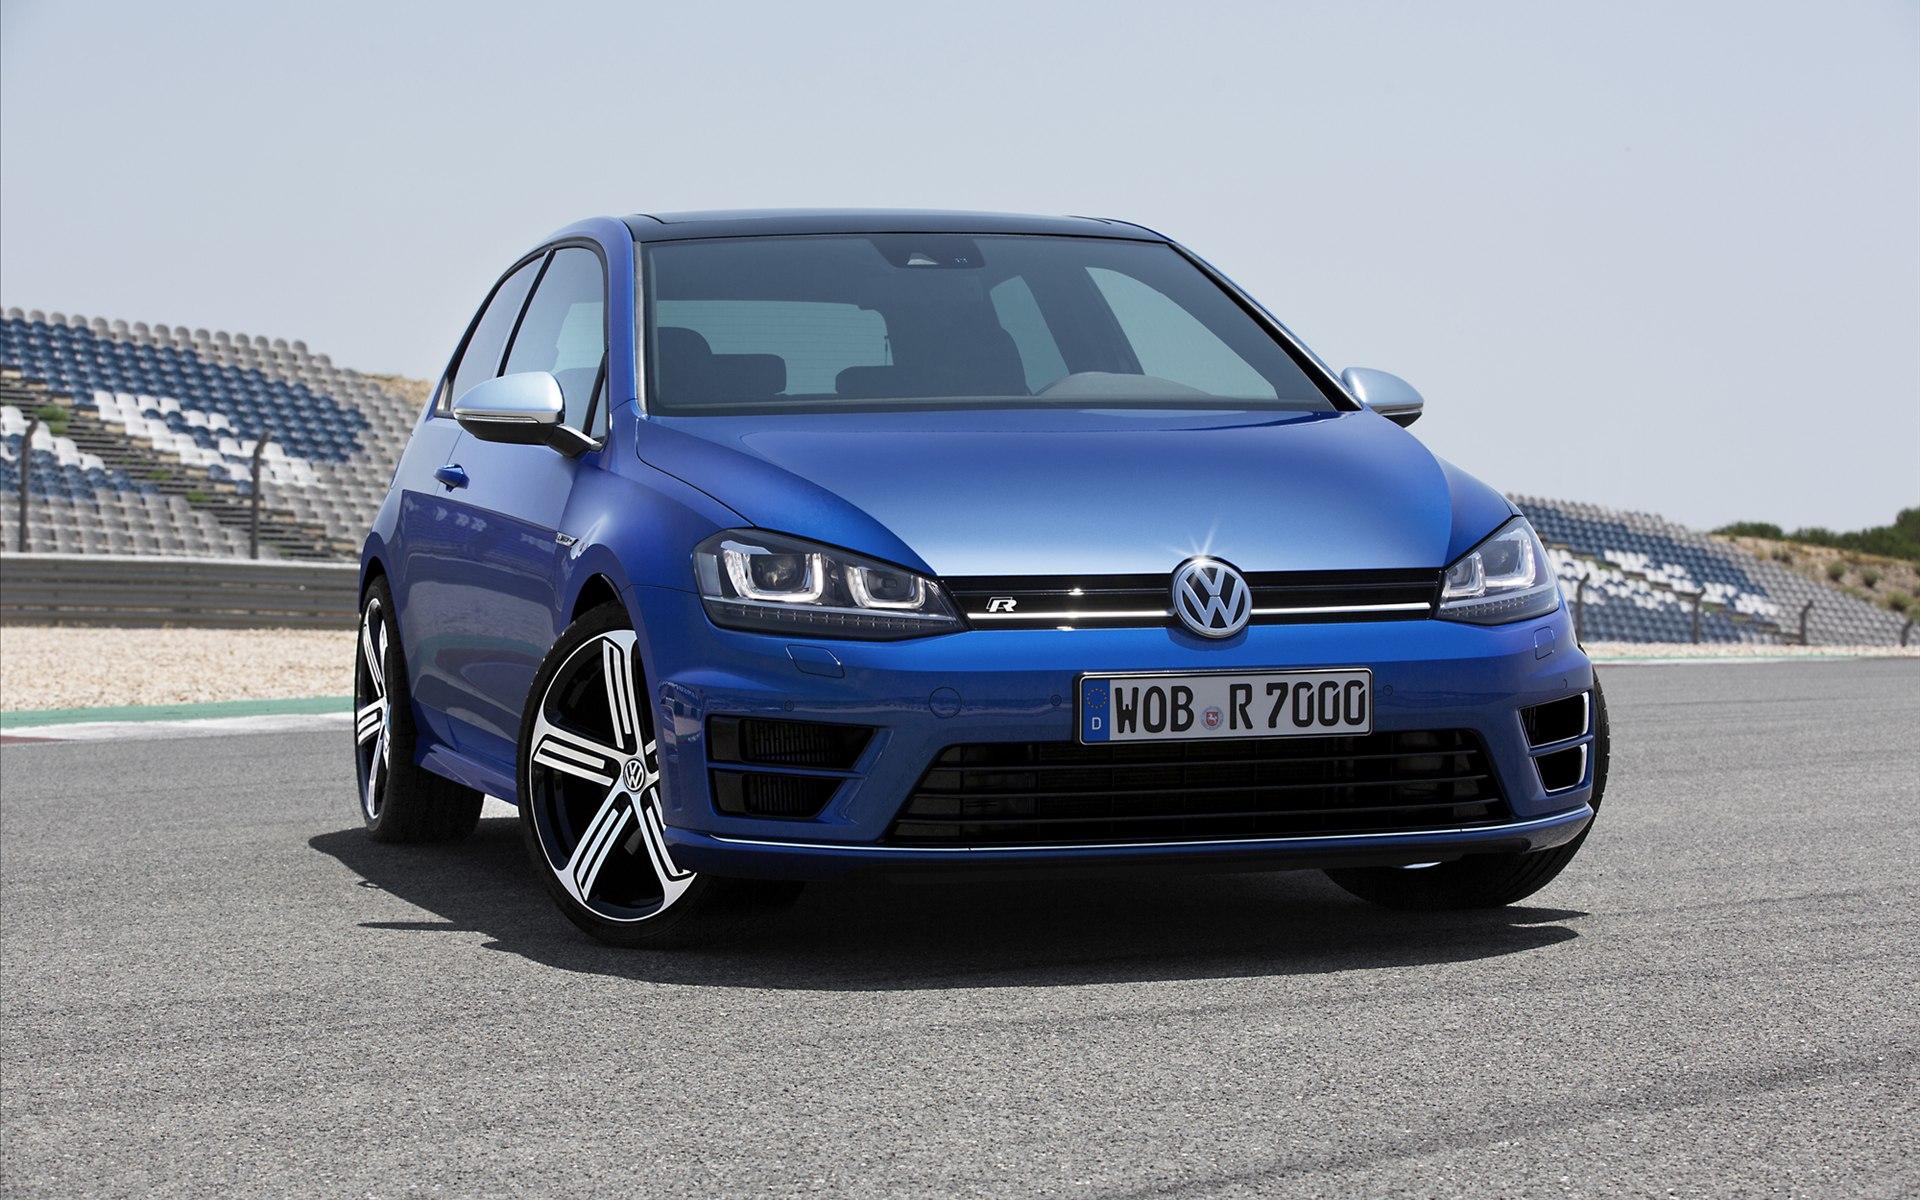 2014 Volkswagen Golf R Wallpaper HD Car Wallpapers 1920x1200